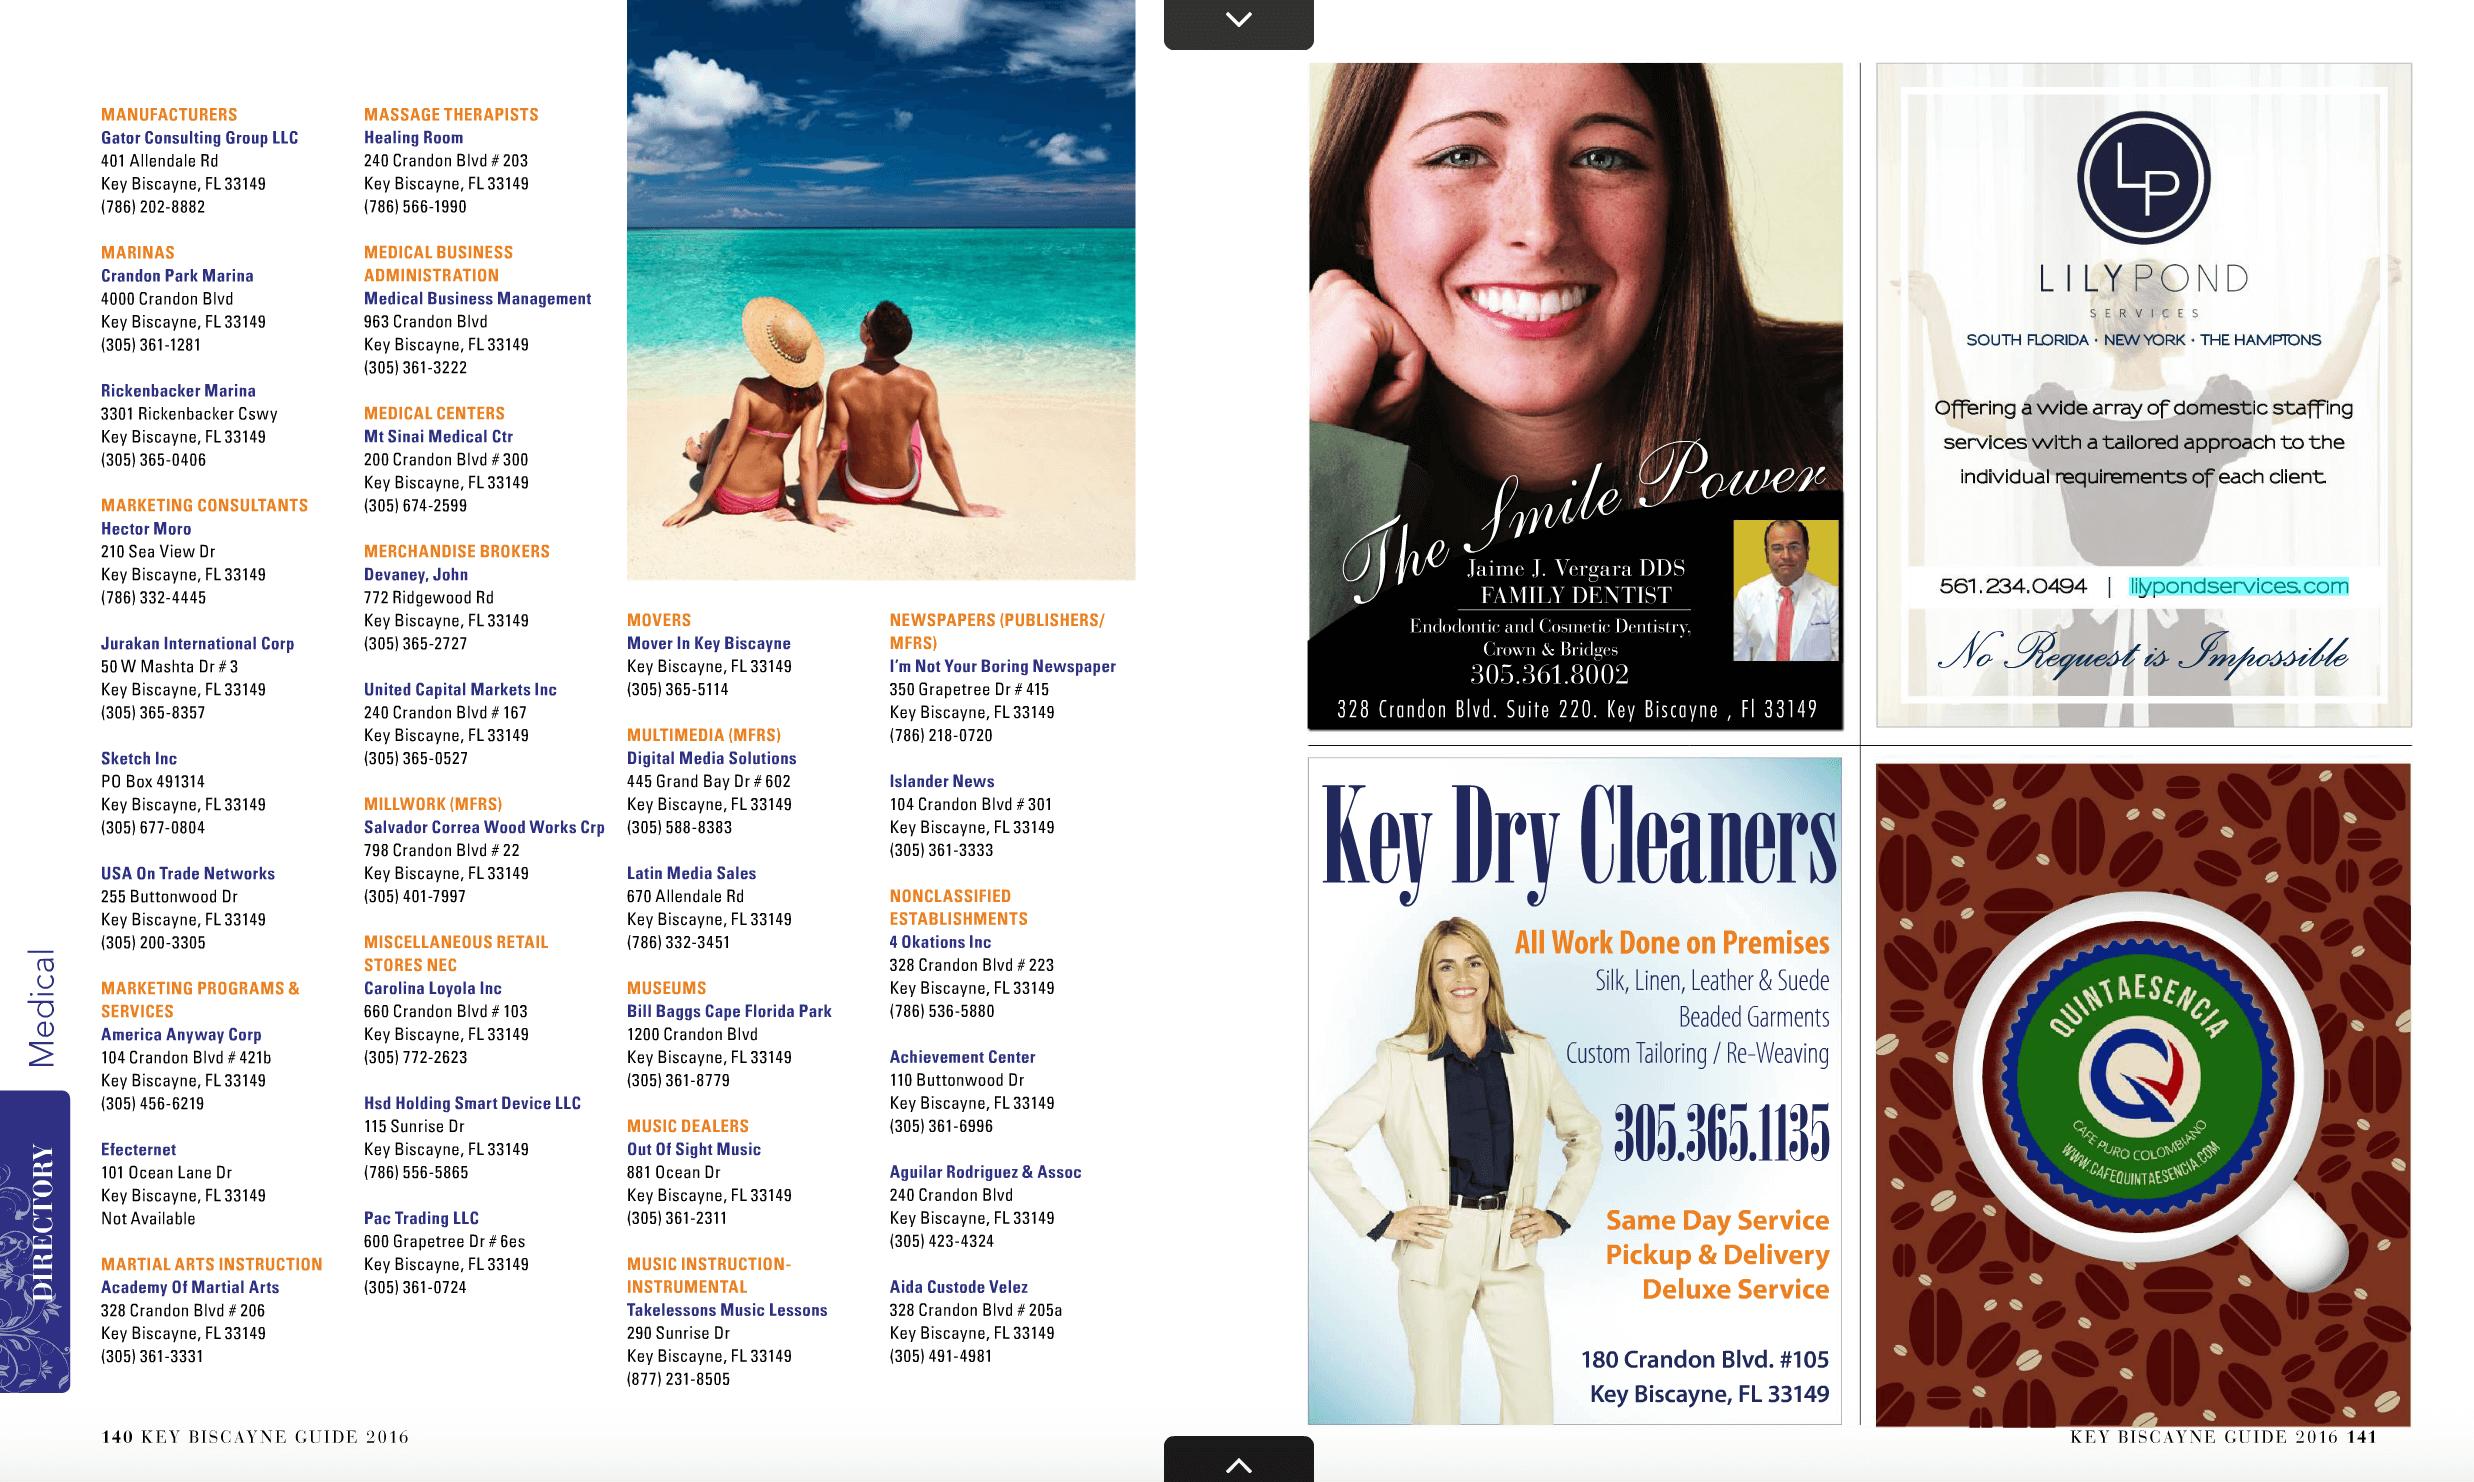 Key Biscayne Page 3